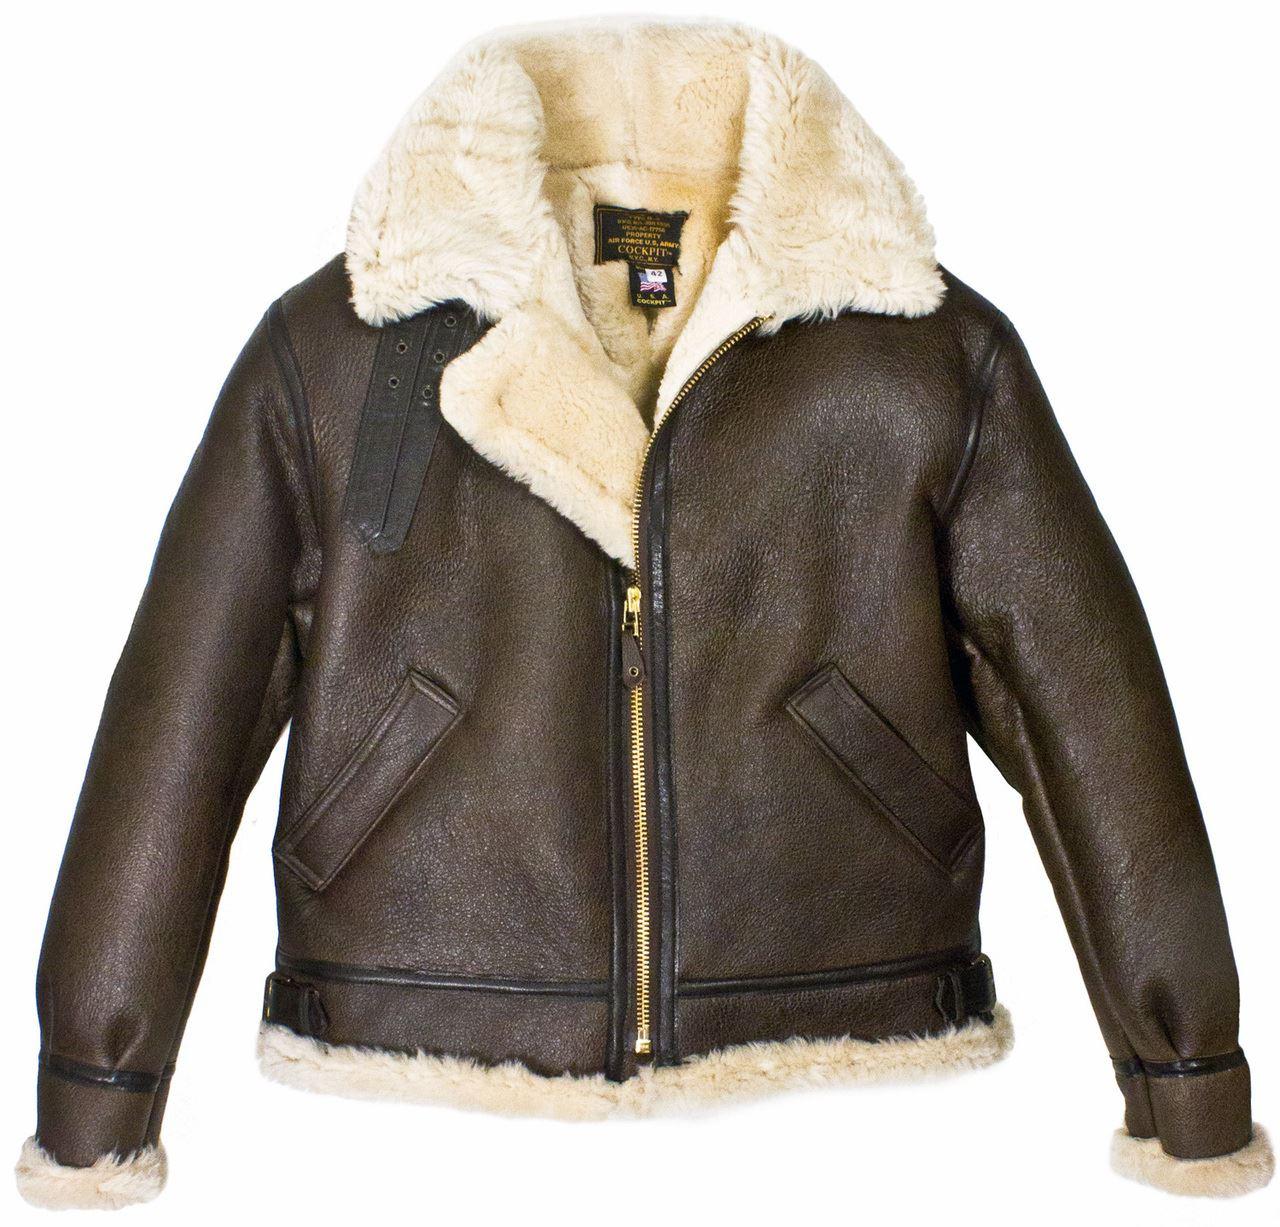 Click on the Image to Enlarge. Mil-Tec US B3 Sheepskin Leather Flight Jacket d027824d6bd